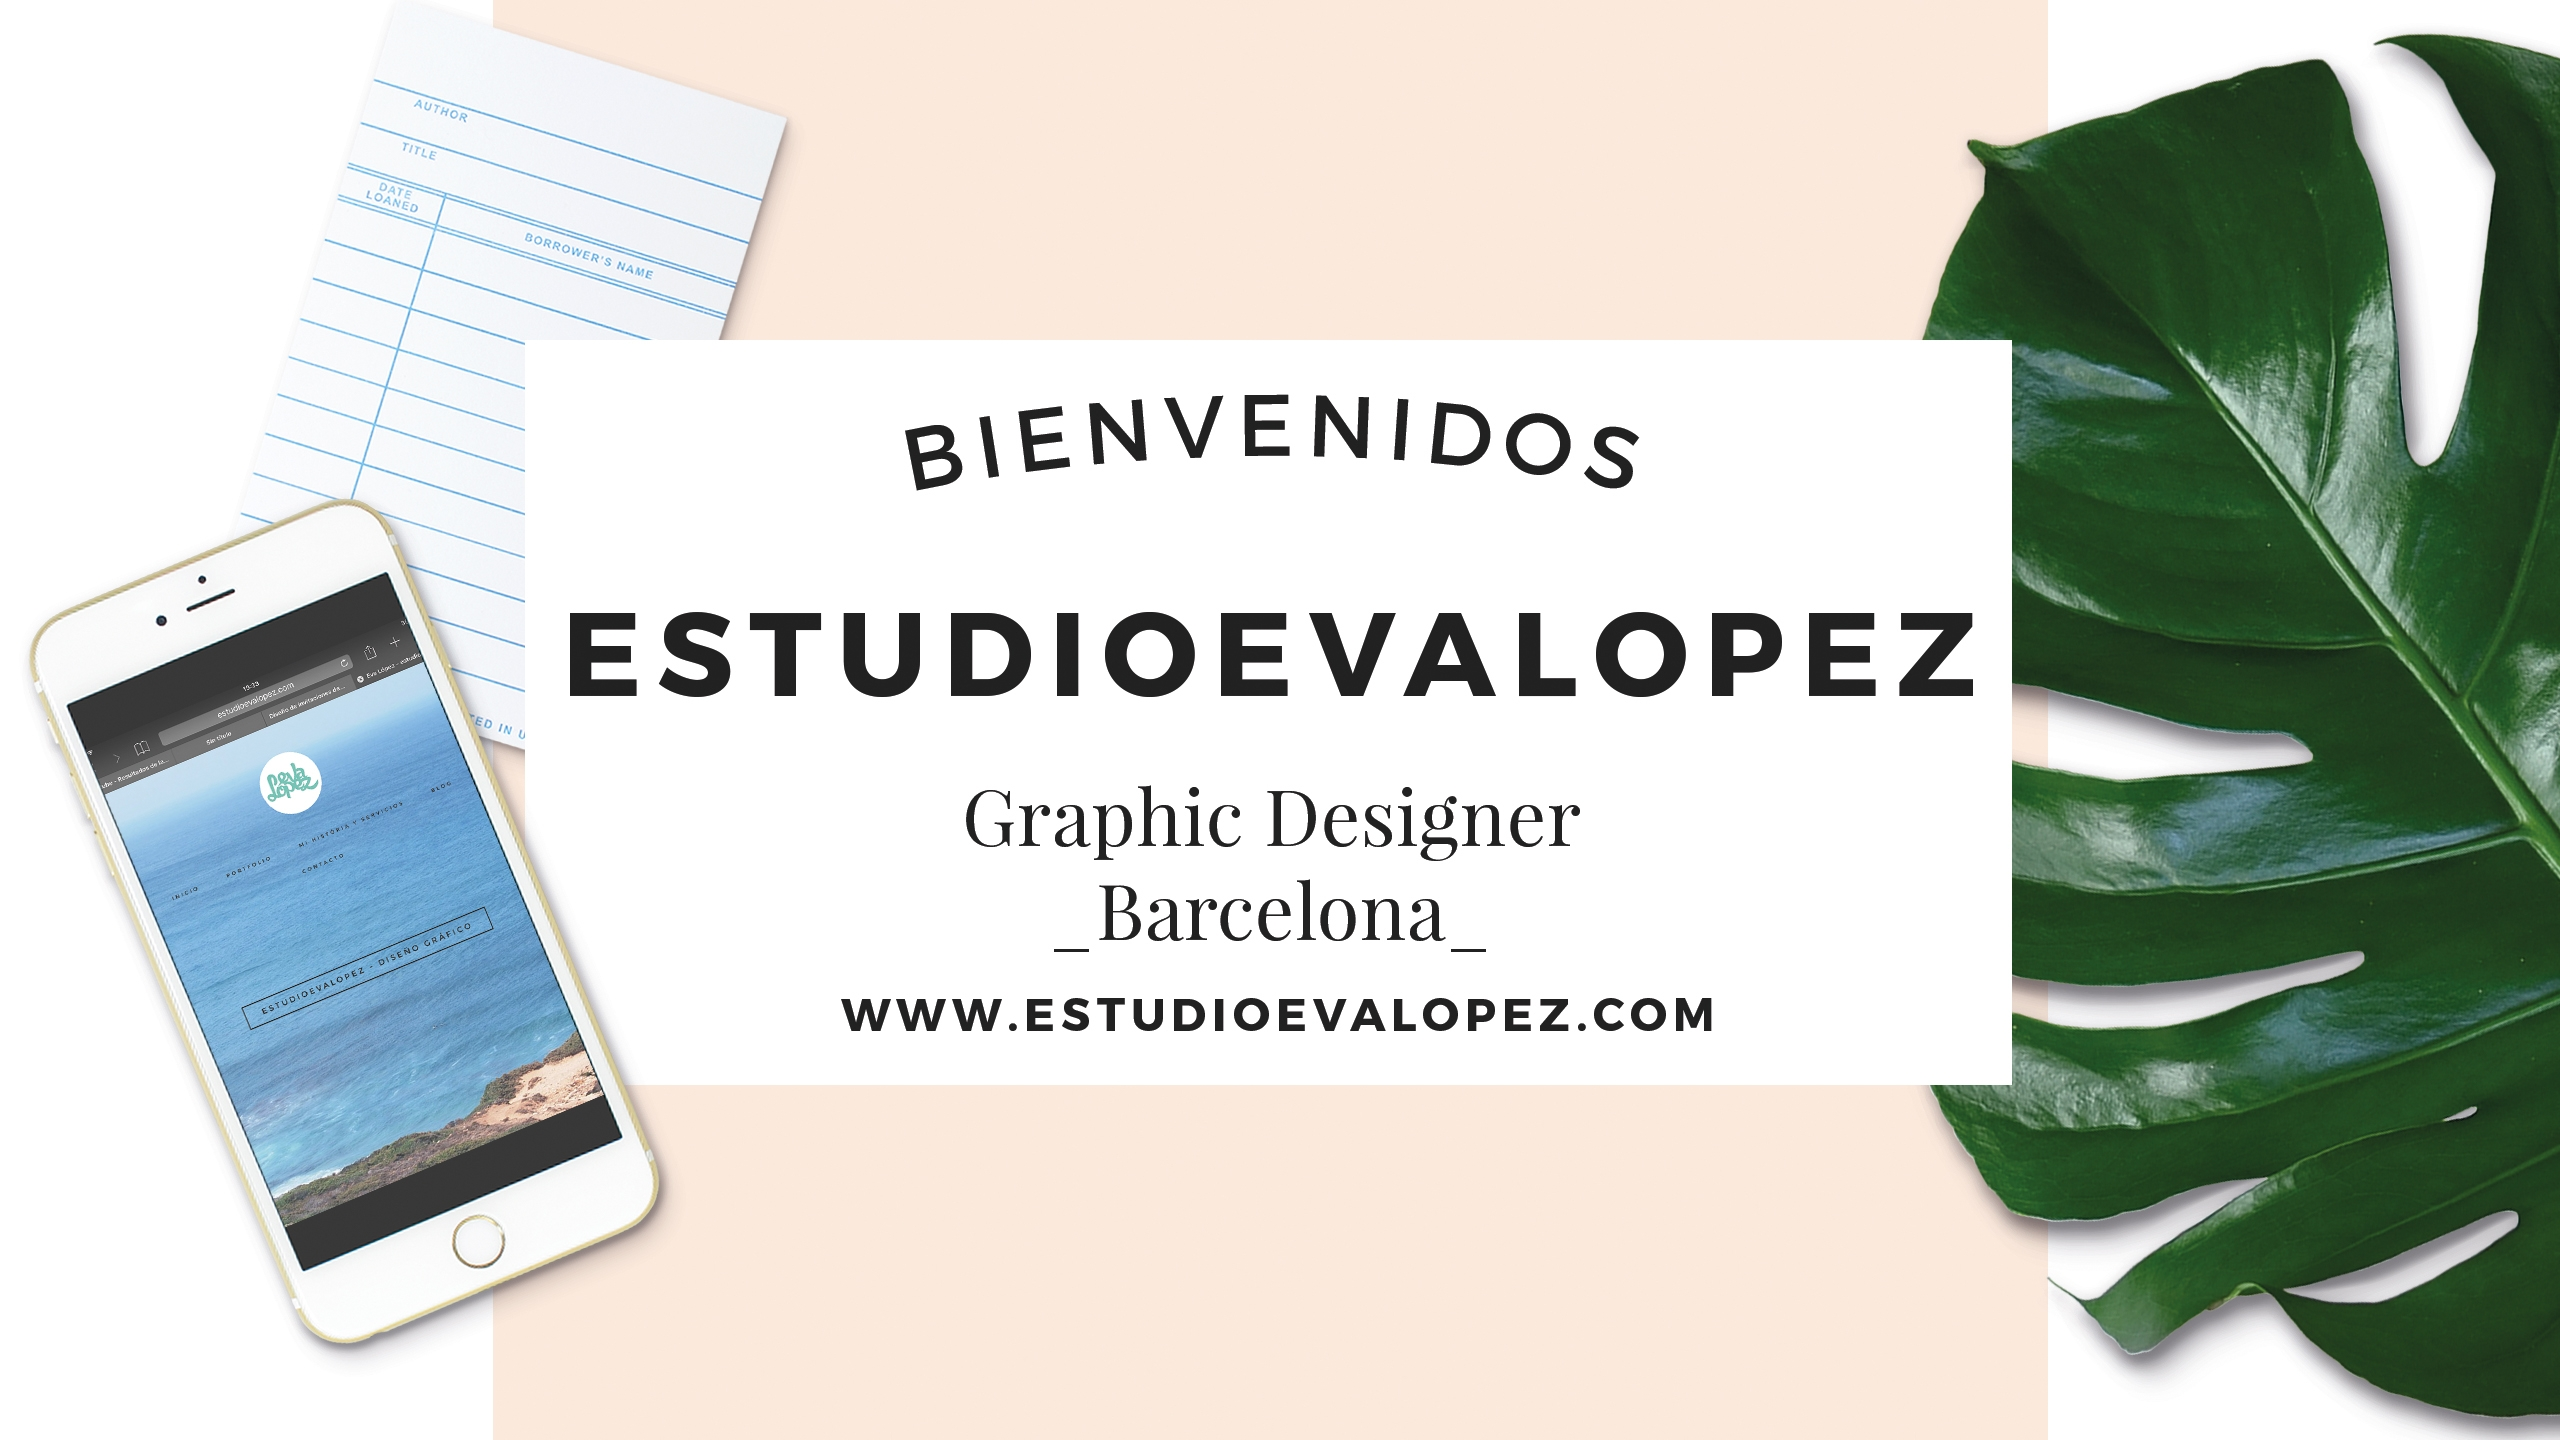 ESTUDIOEVALOPEZ (@estudioevalopez) Cover Image